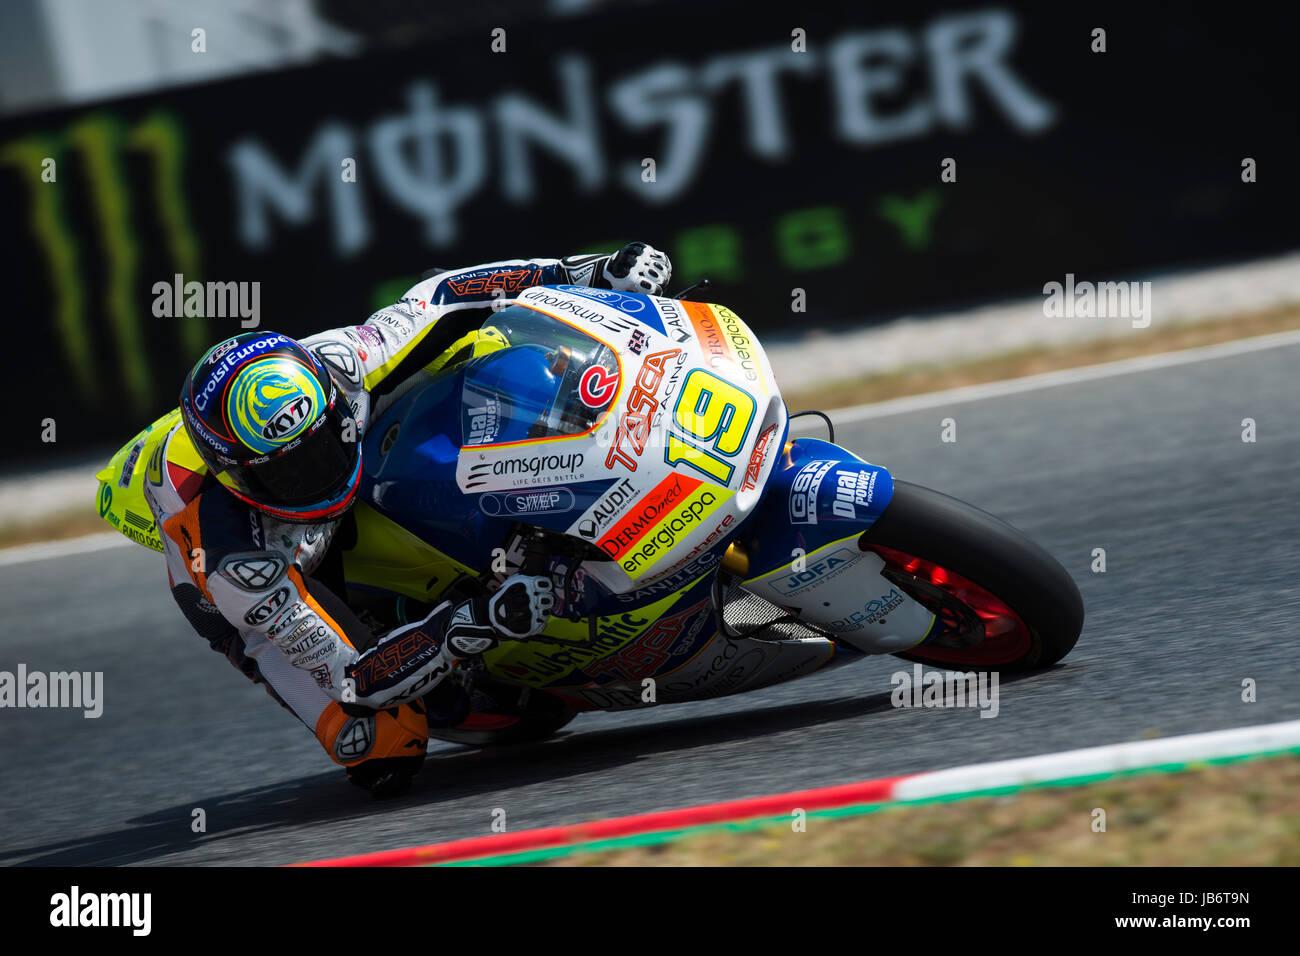 Montmelo, Spain. 09th June, 2017. #19 Xavier Simeon (Bel) Tasca Racing Scuderia Moto2 Kalex during a free practice - Stock Image